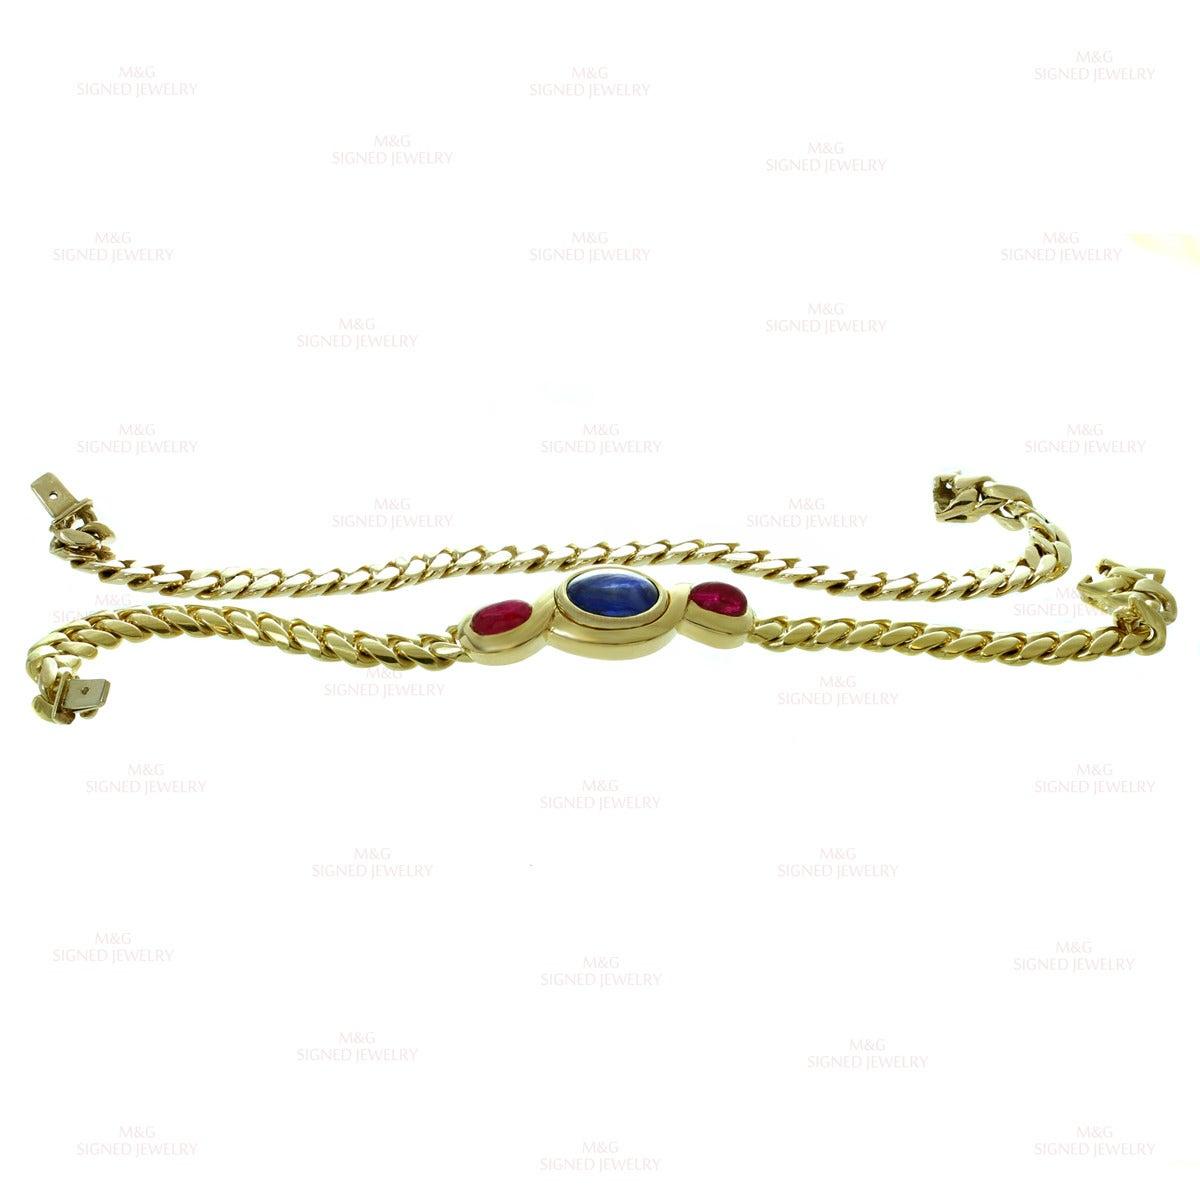 1980s Bulgari Classic Sapphire Ruby Gold Link Interchangeable Bracelet Necklace 6